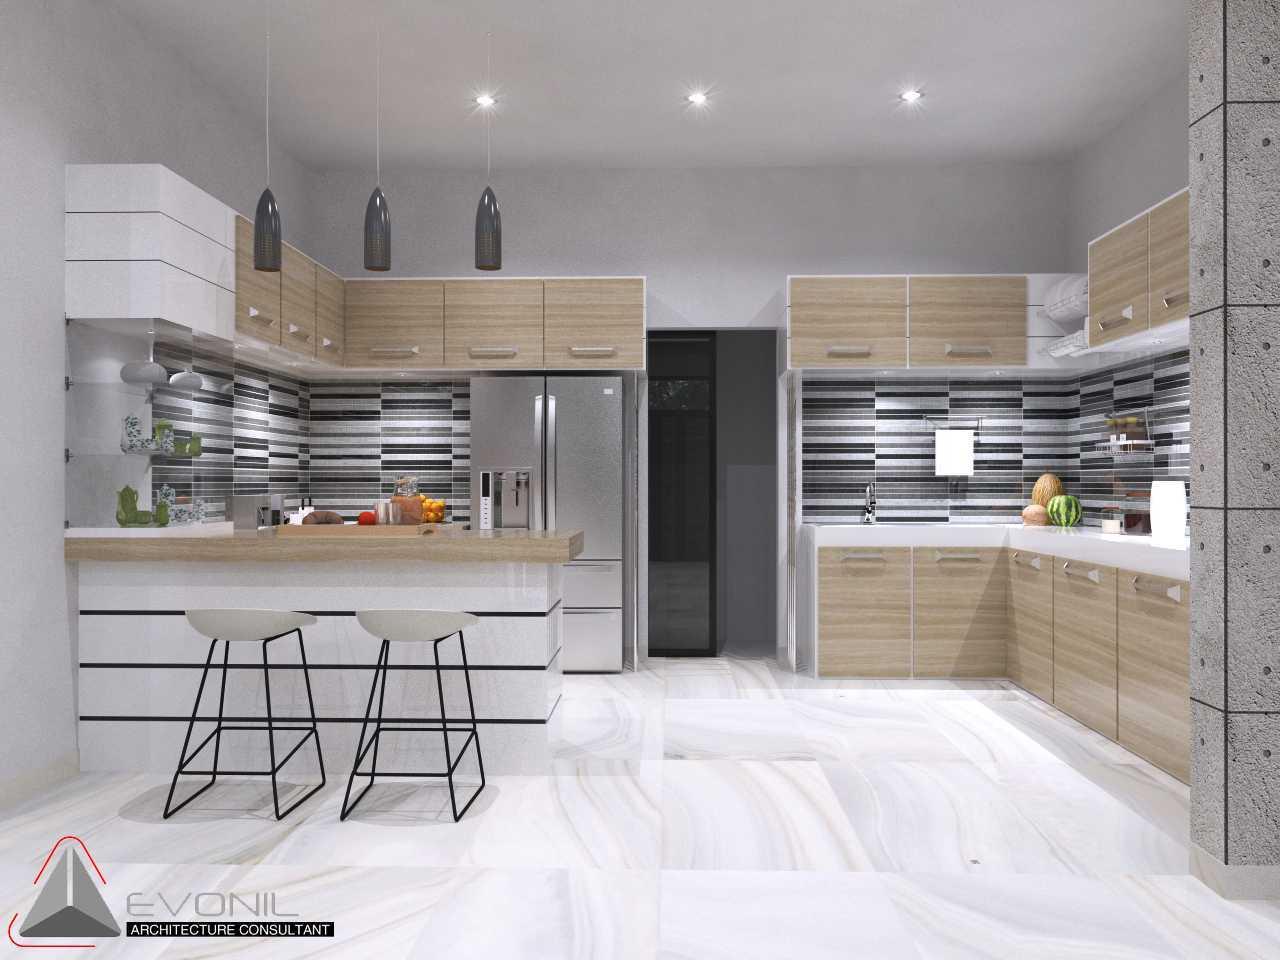 Foto inspirasi ide desain retail asian Dapur-rev oleh Evonil Architecture di Arsitag